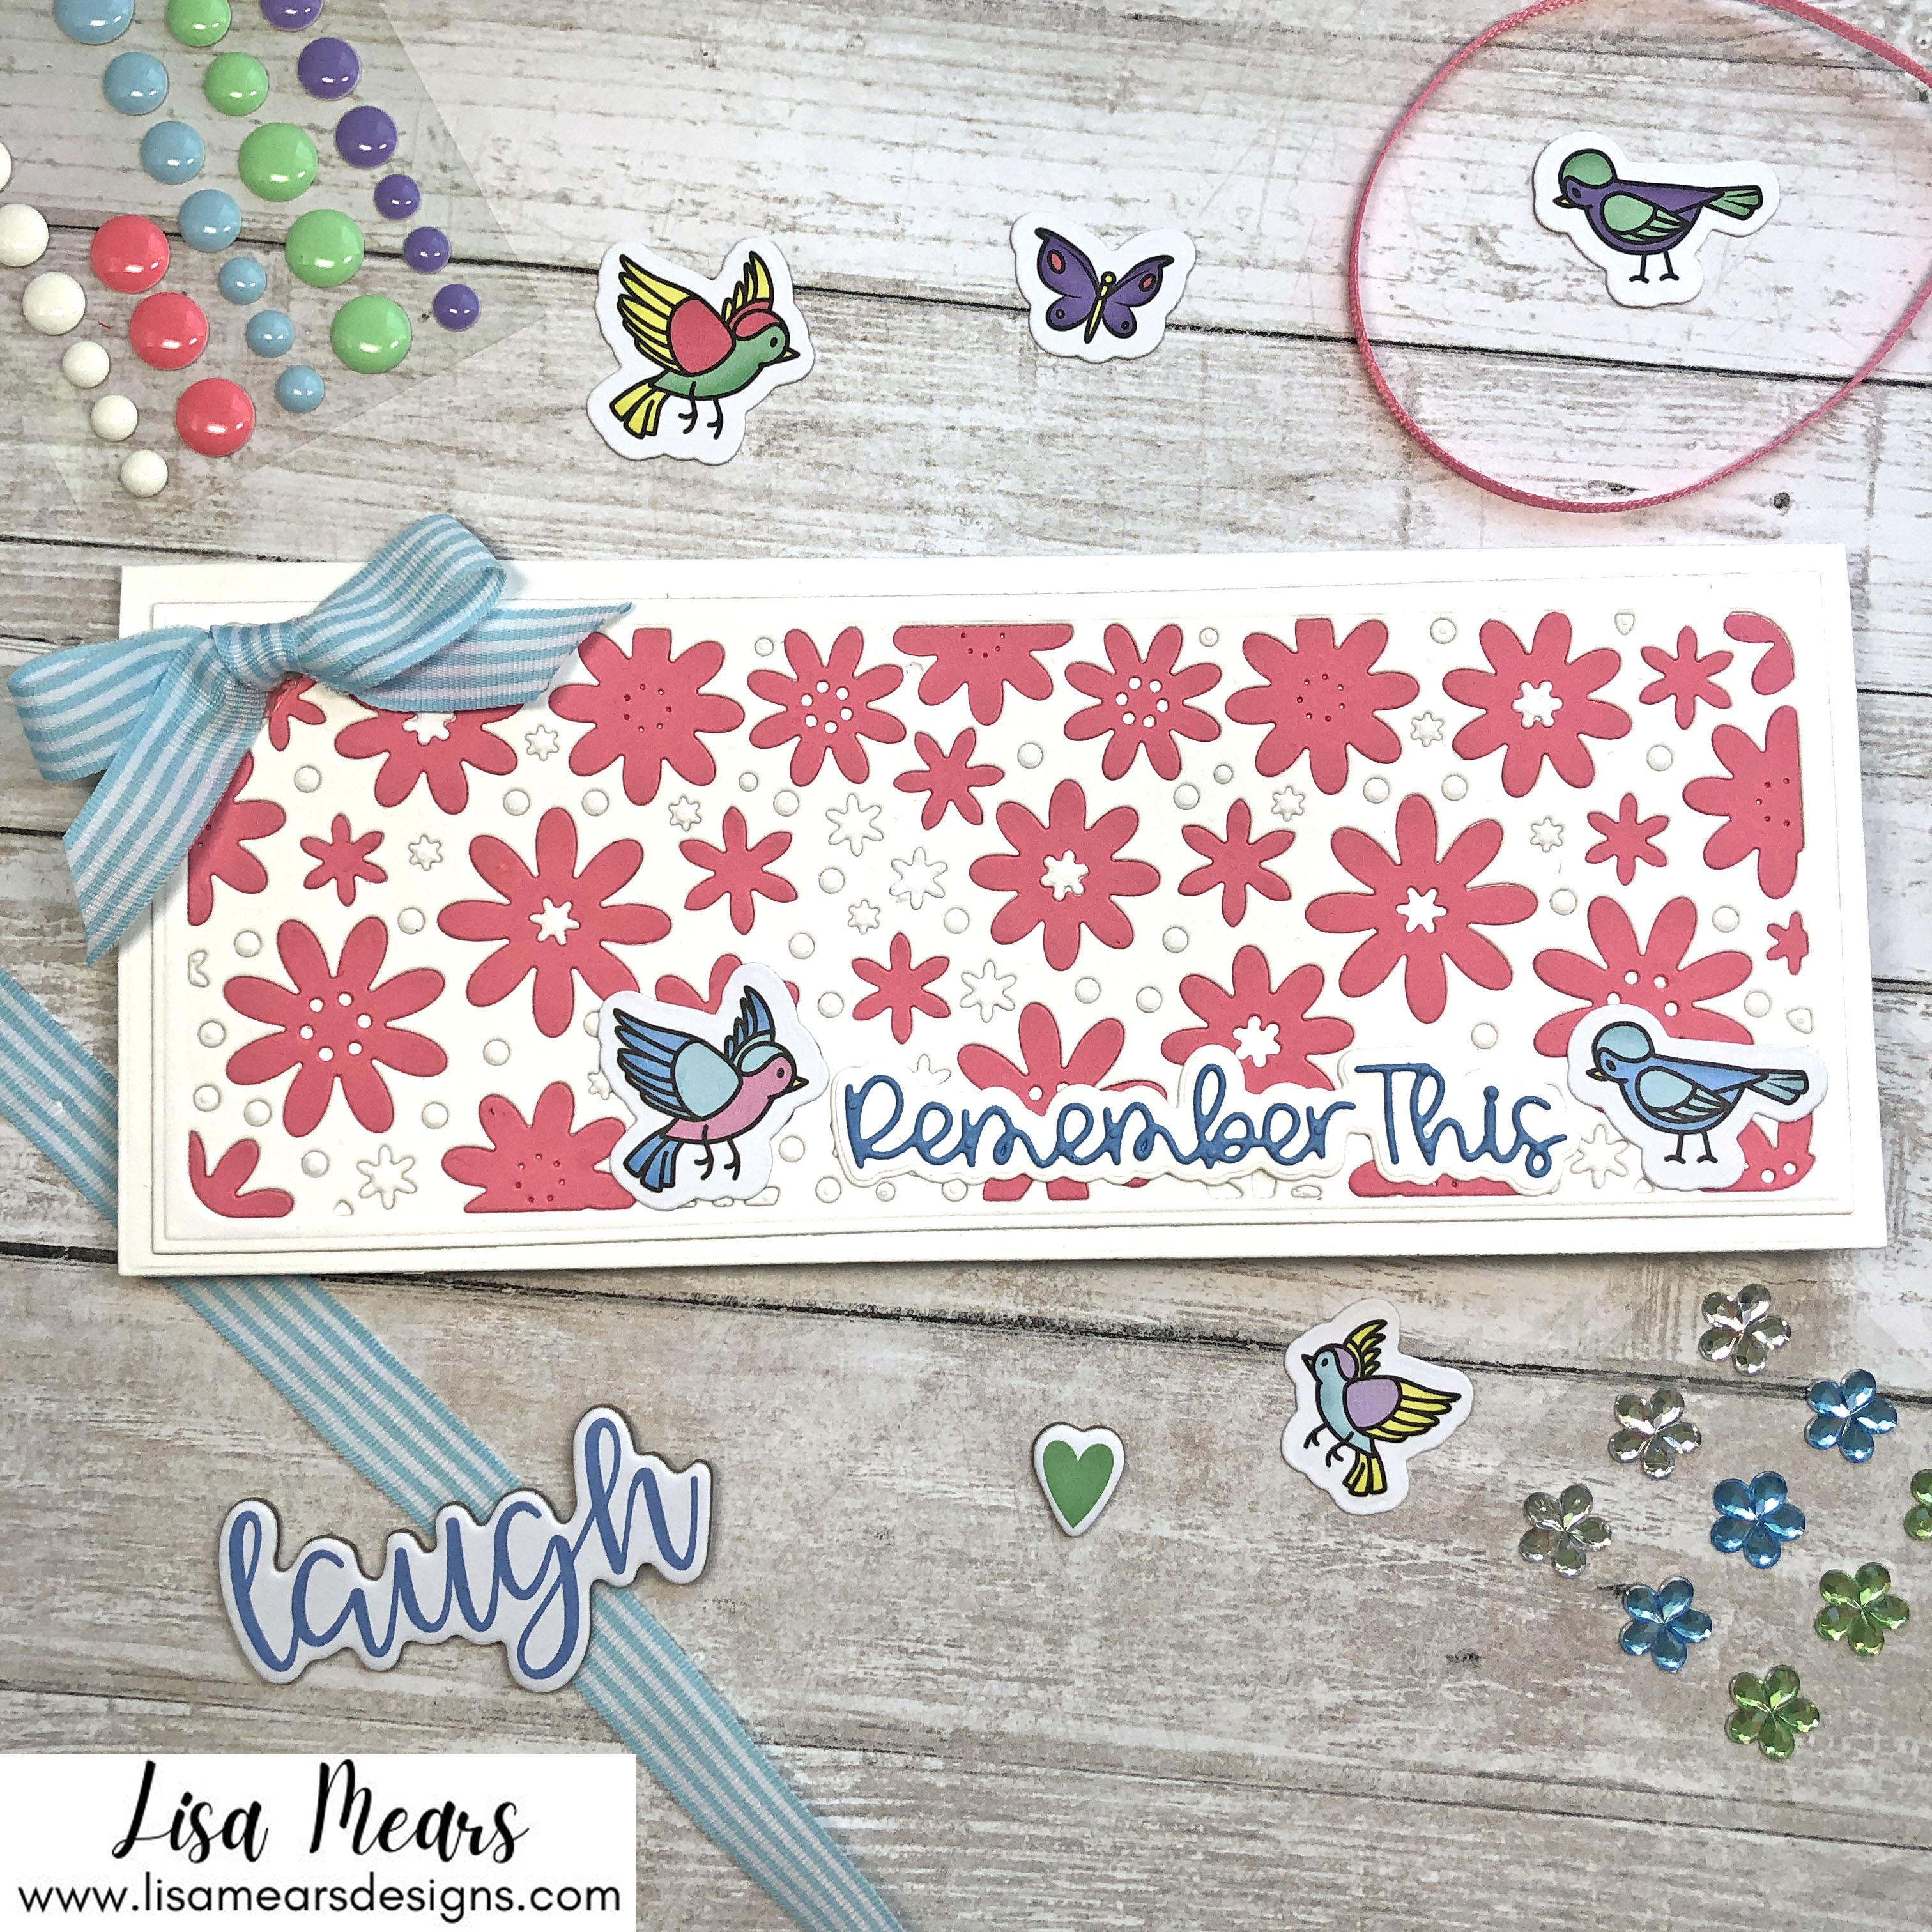 Handmade Sympathy Card with Birdbath and Lattice Background